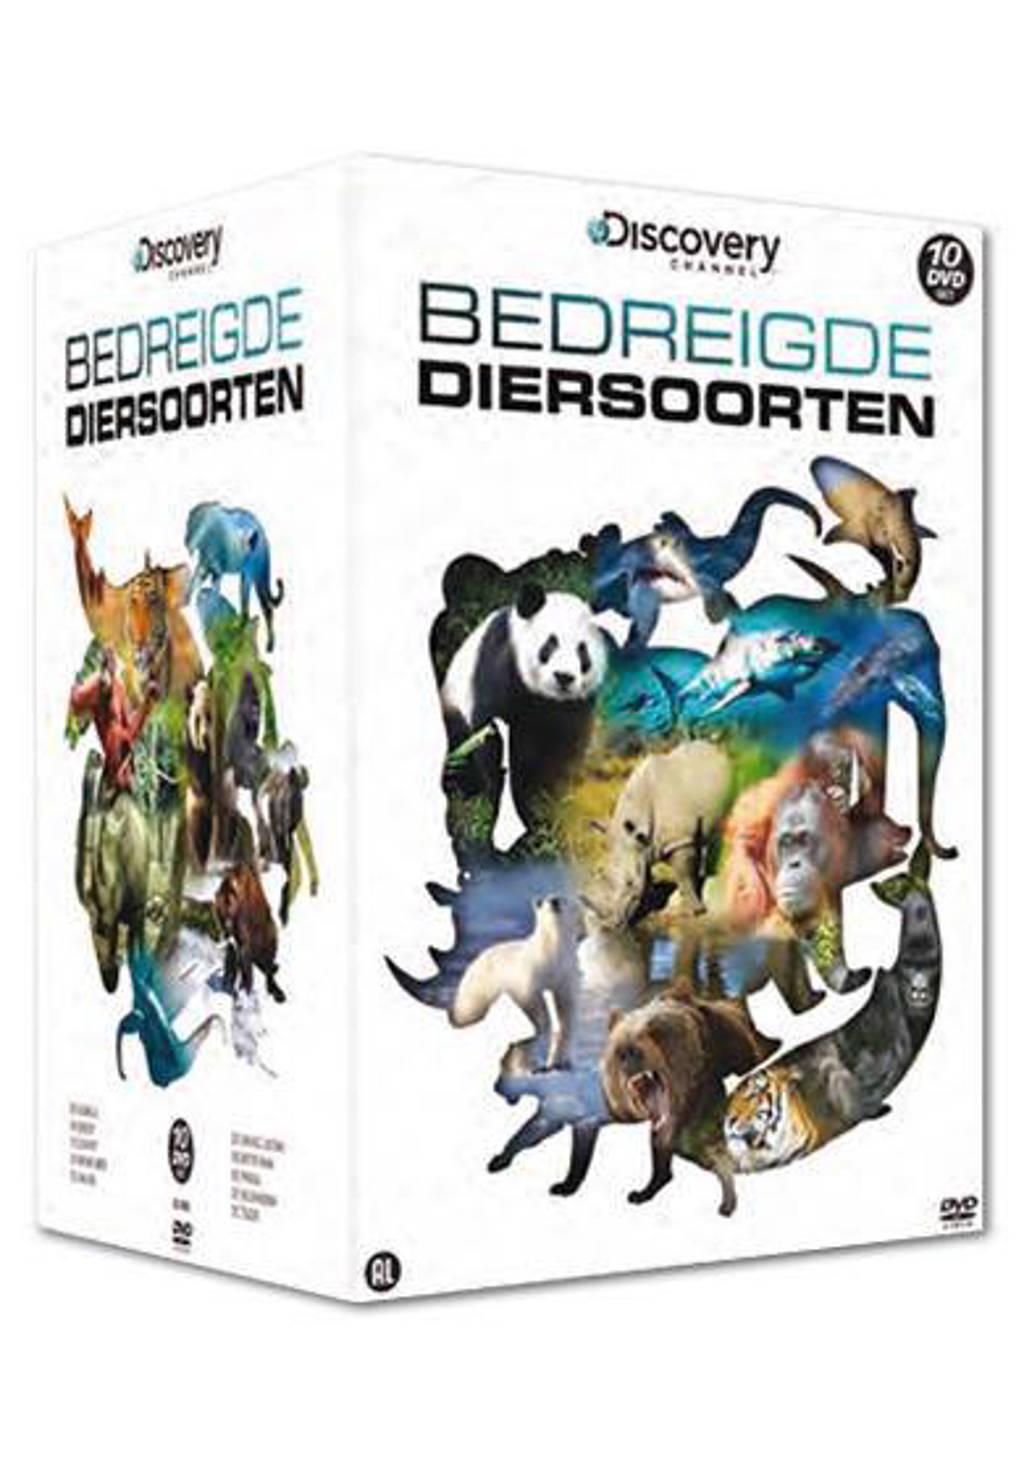 Bedreigde diersoorten (DVD)